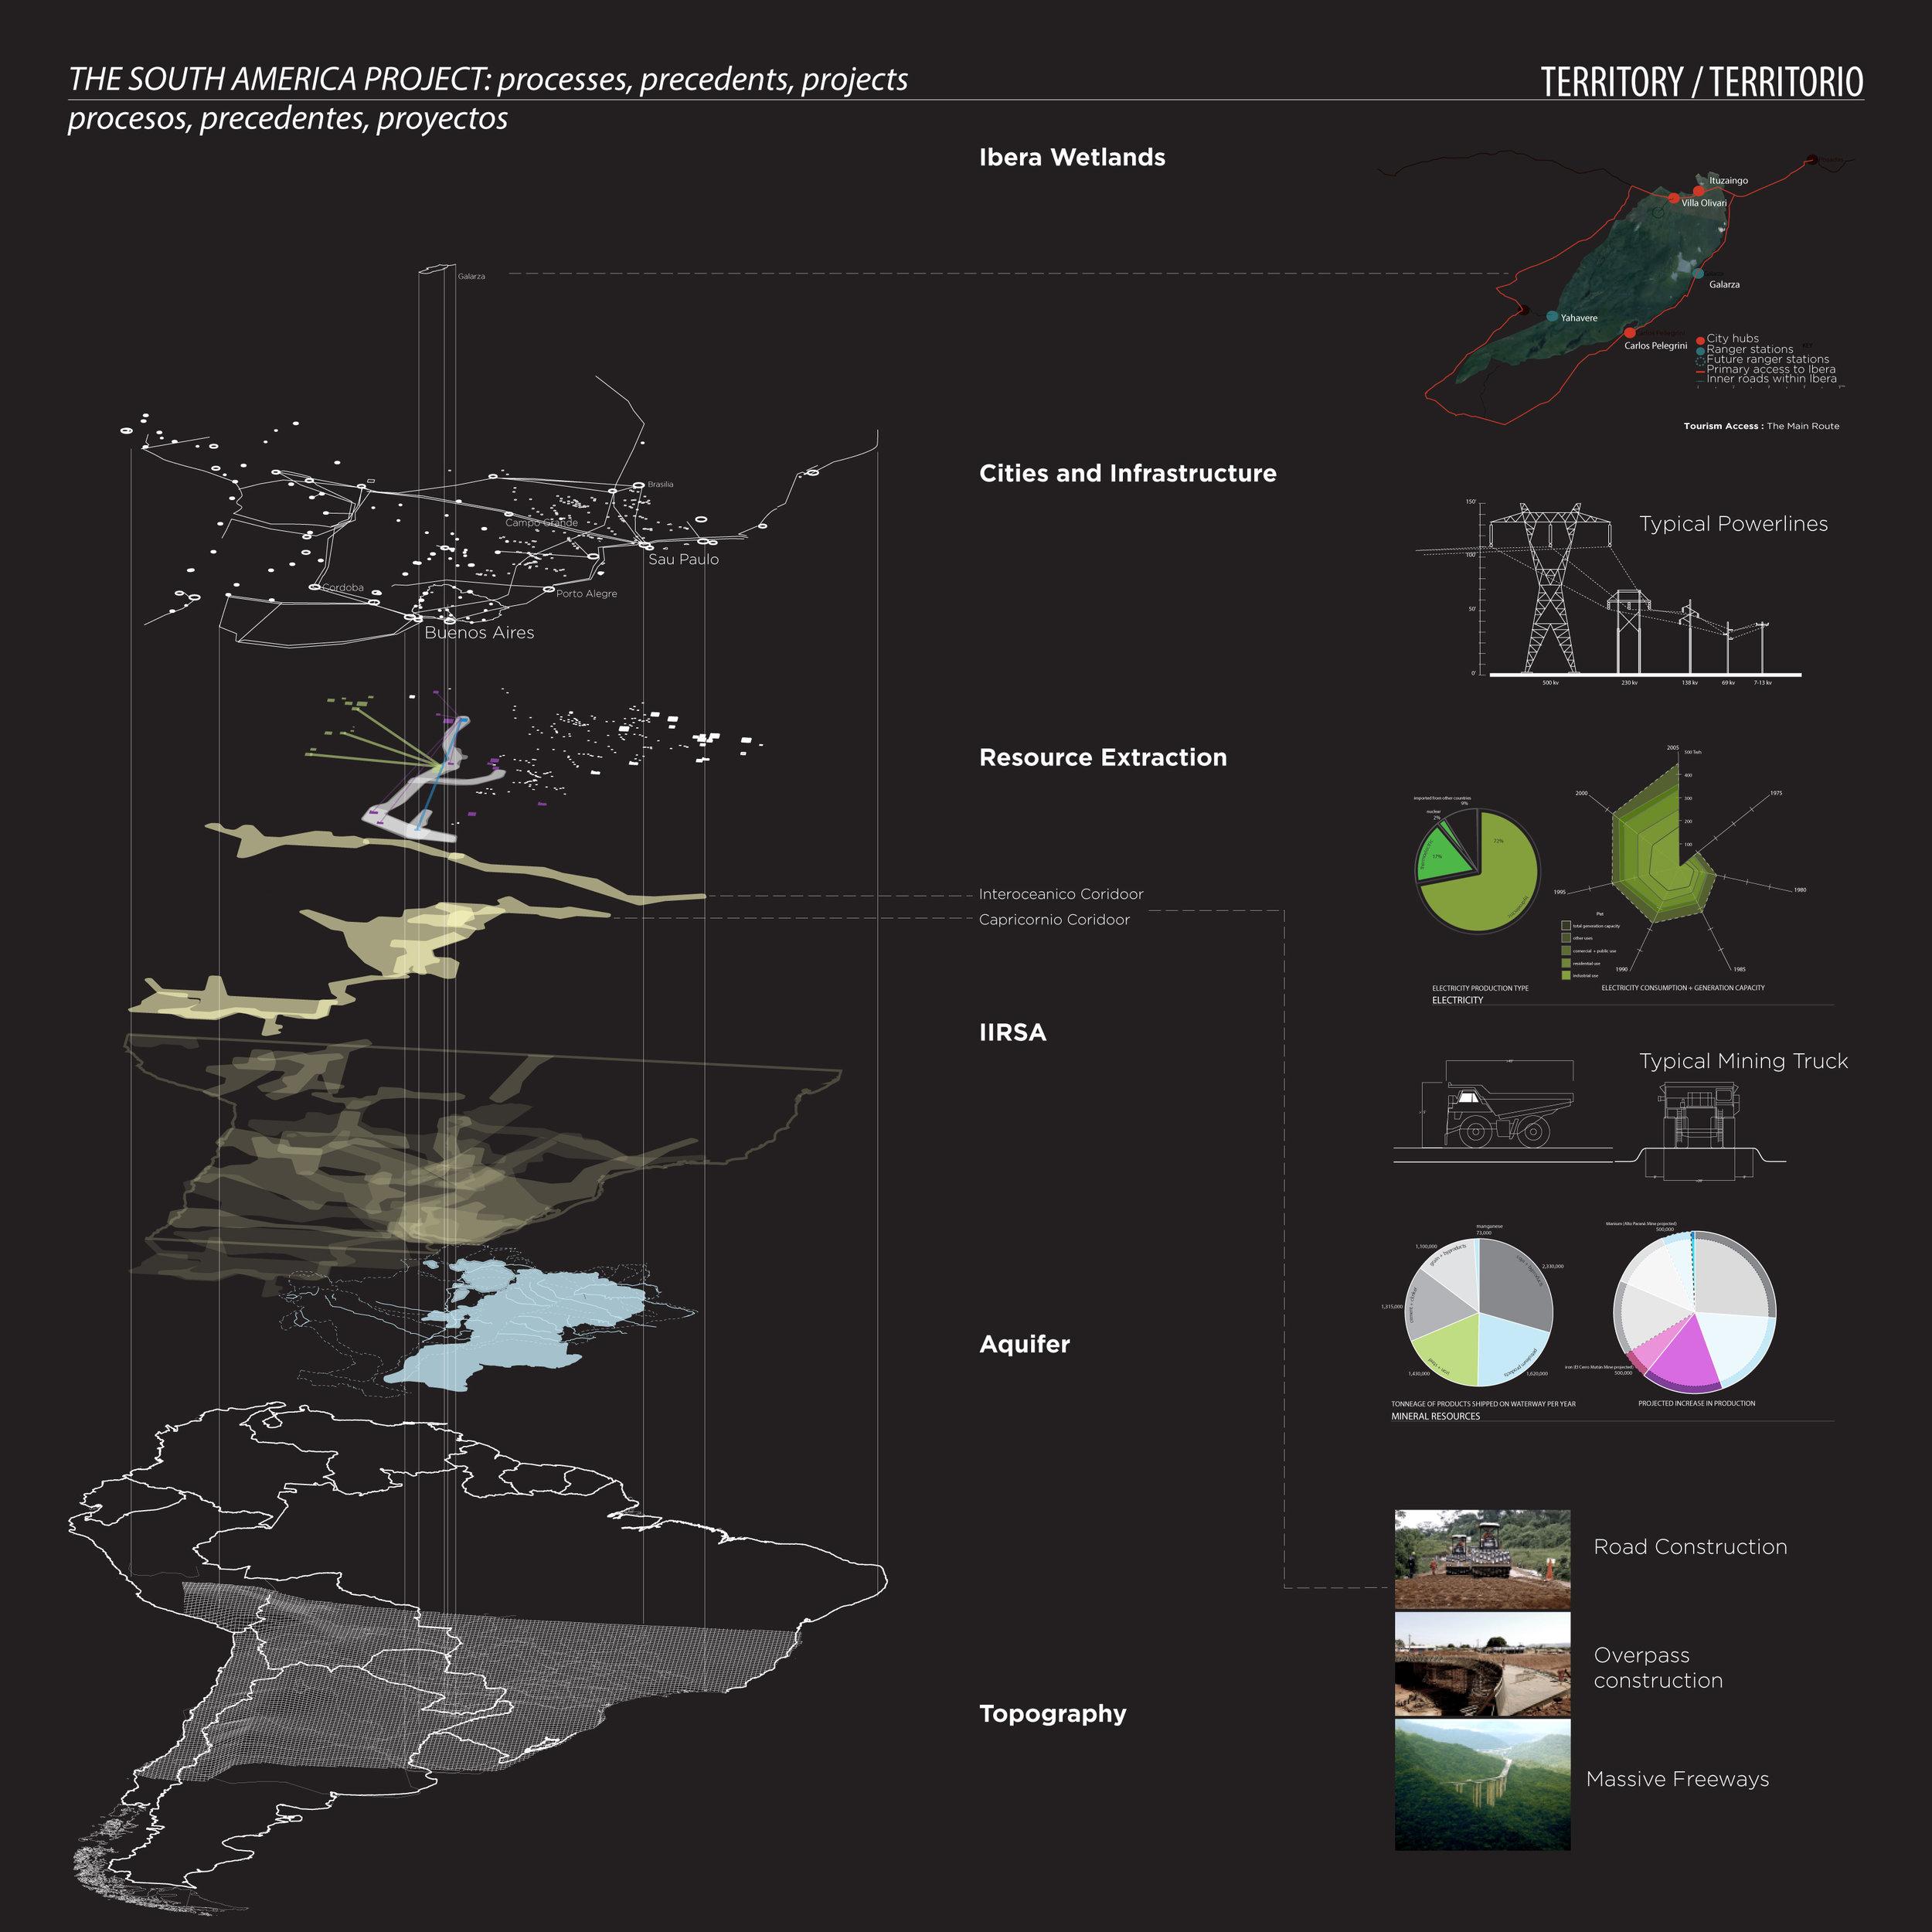 Hydrogeographies-1-territory.jpg